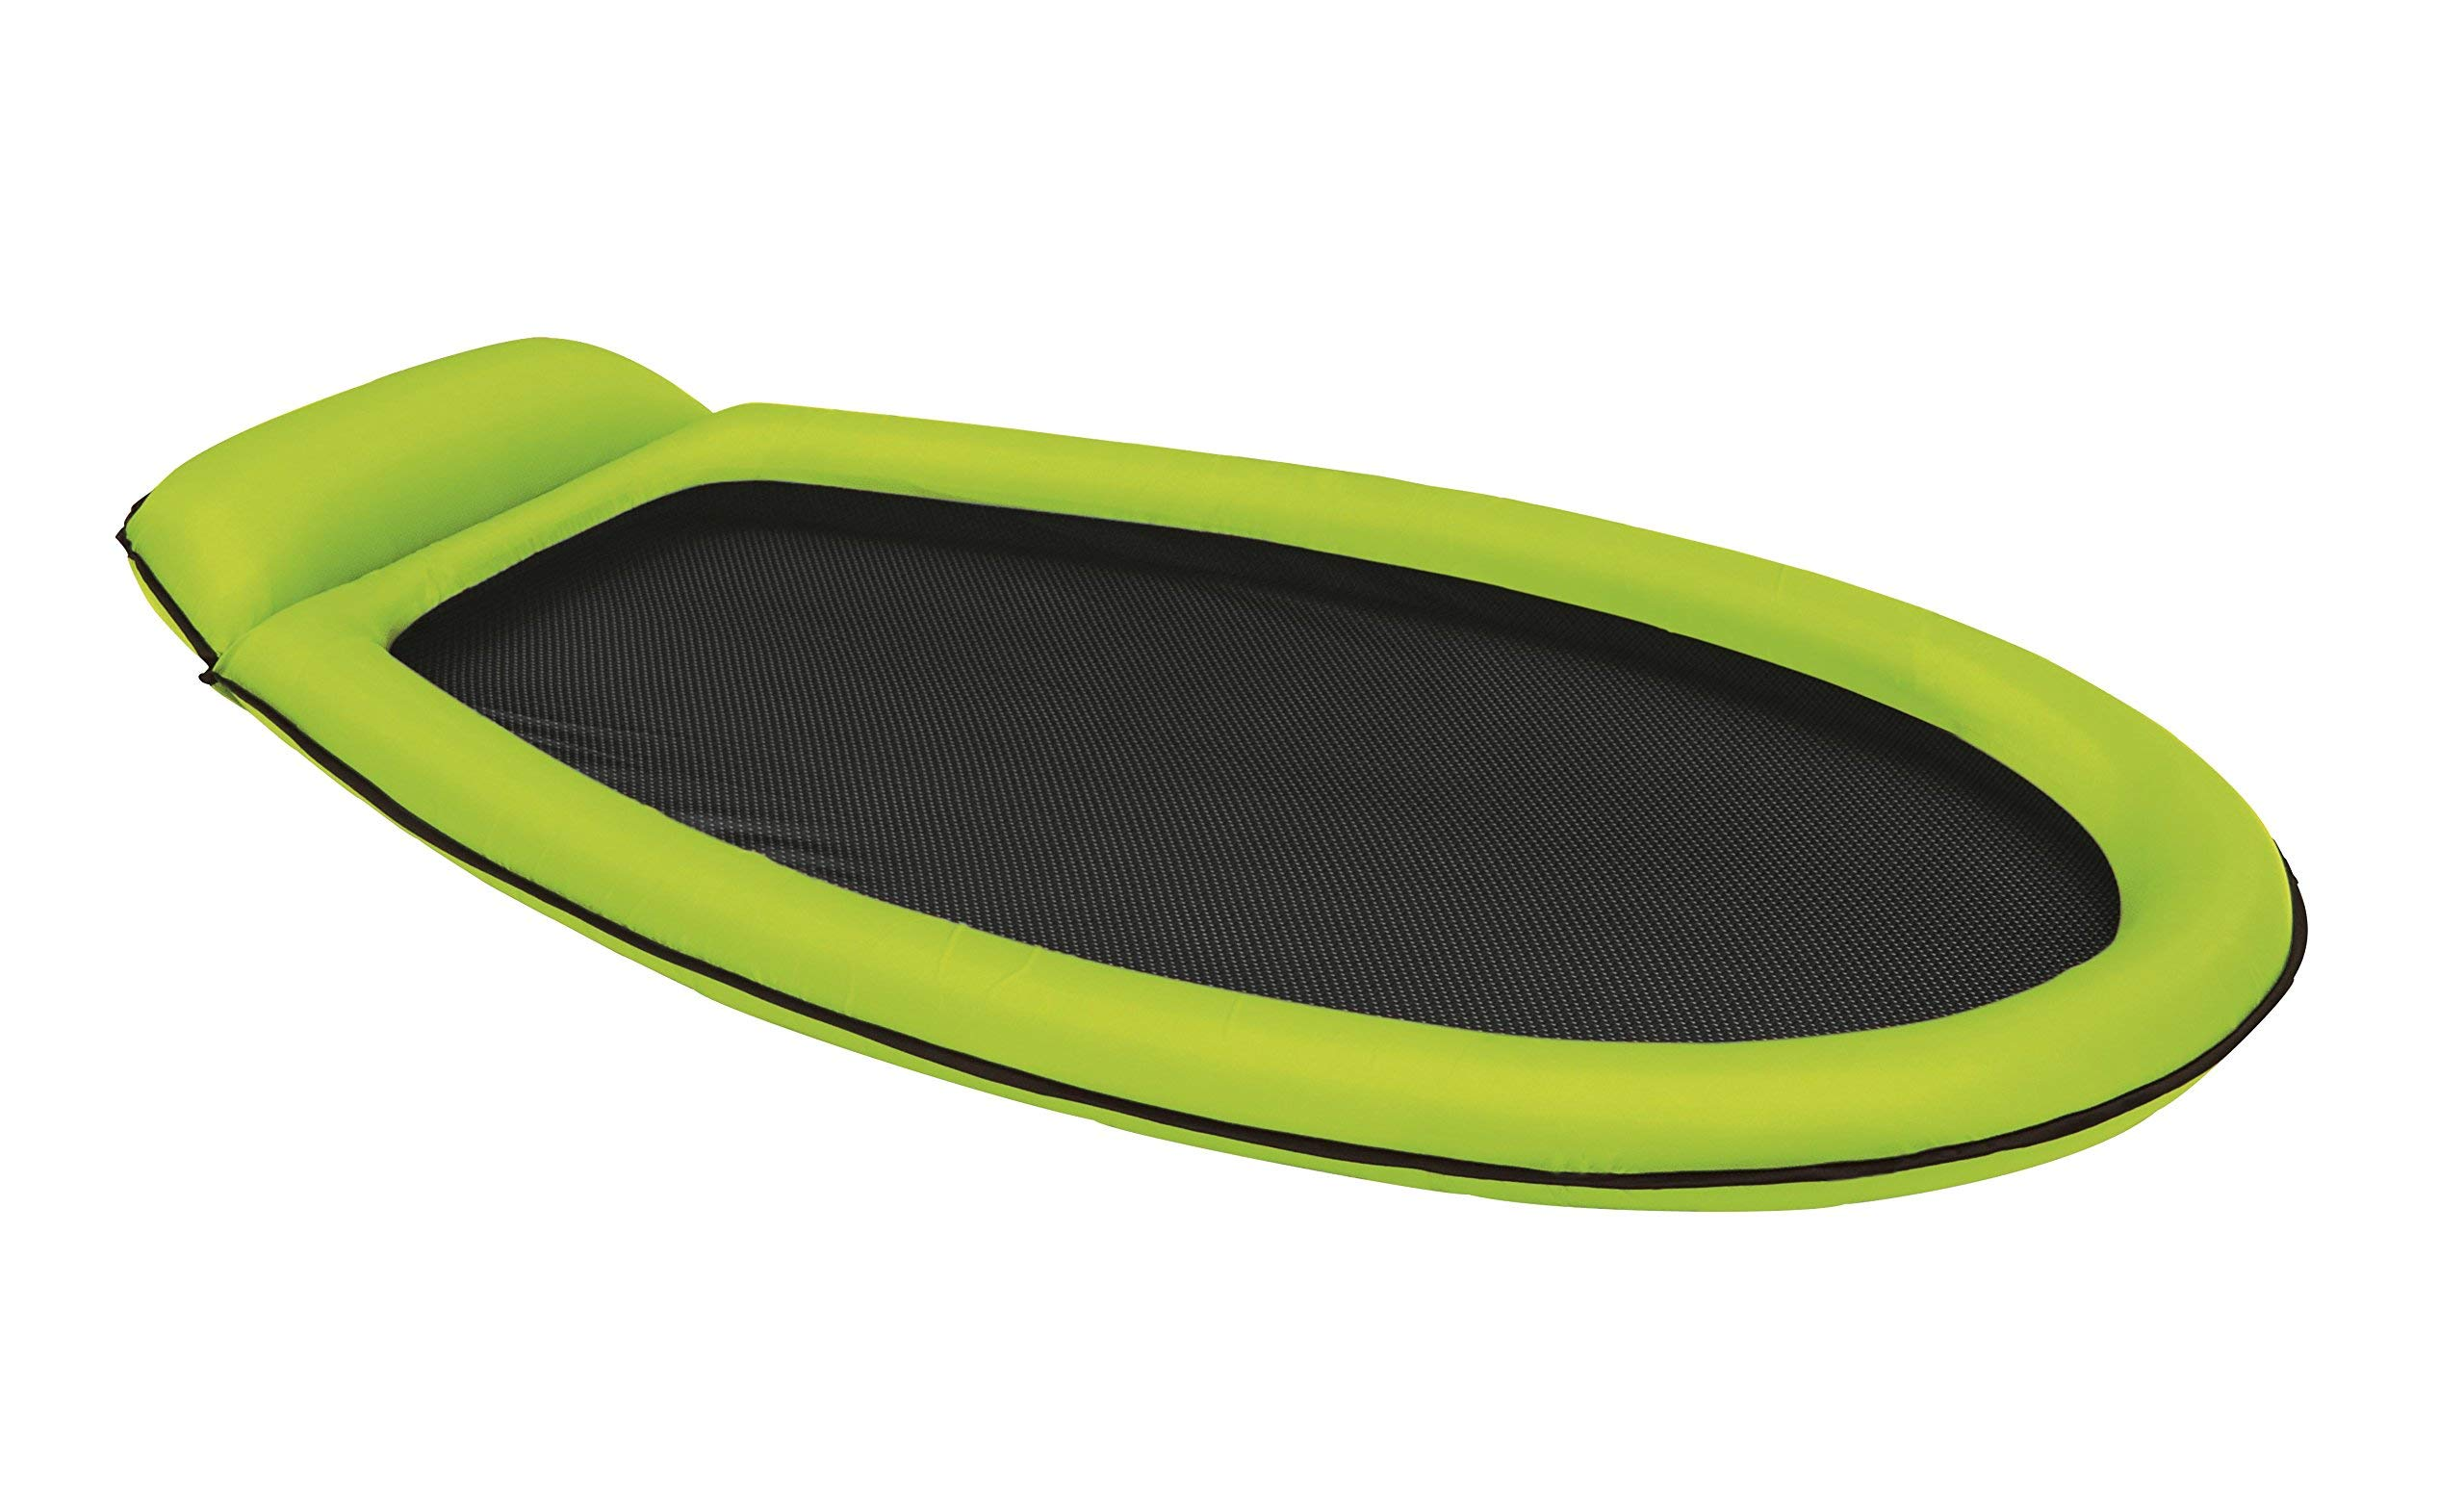 Intex - Mesh mat - Comfort - 178x94 cm